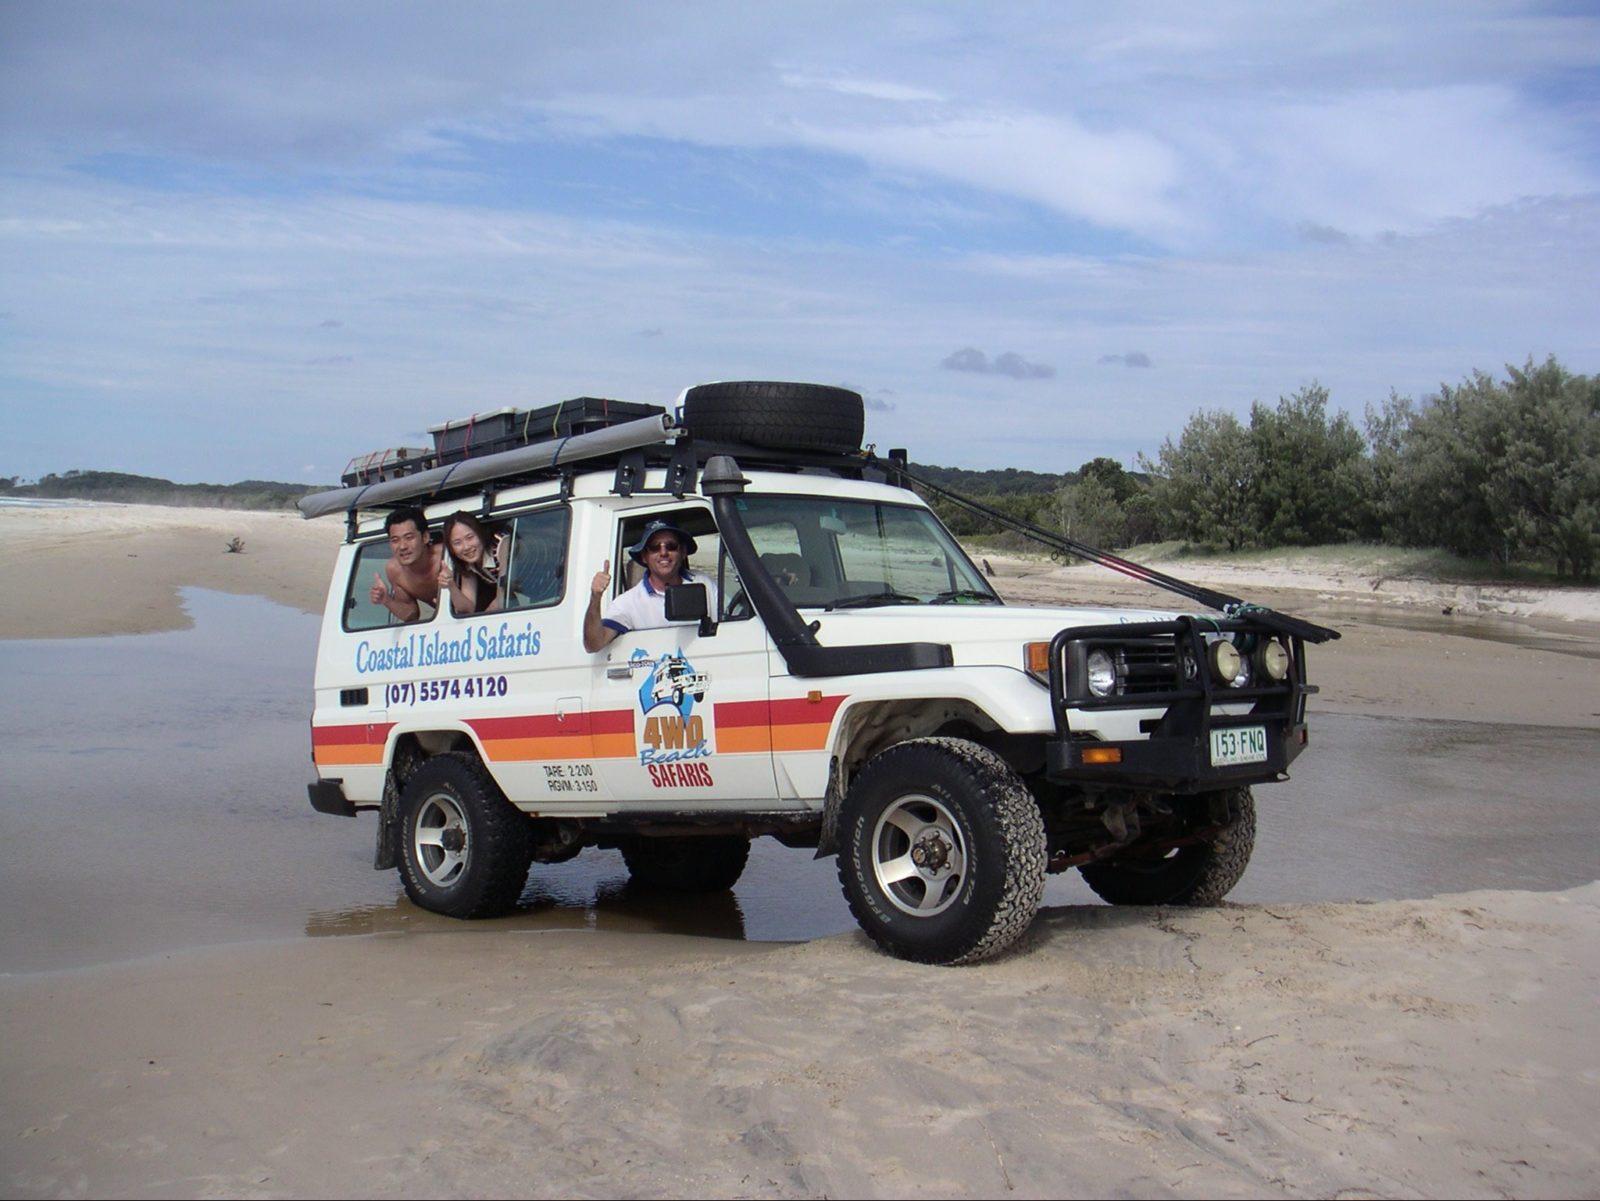 Coastal Island Safaris